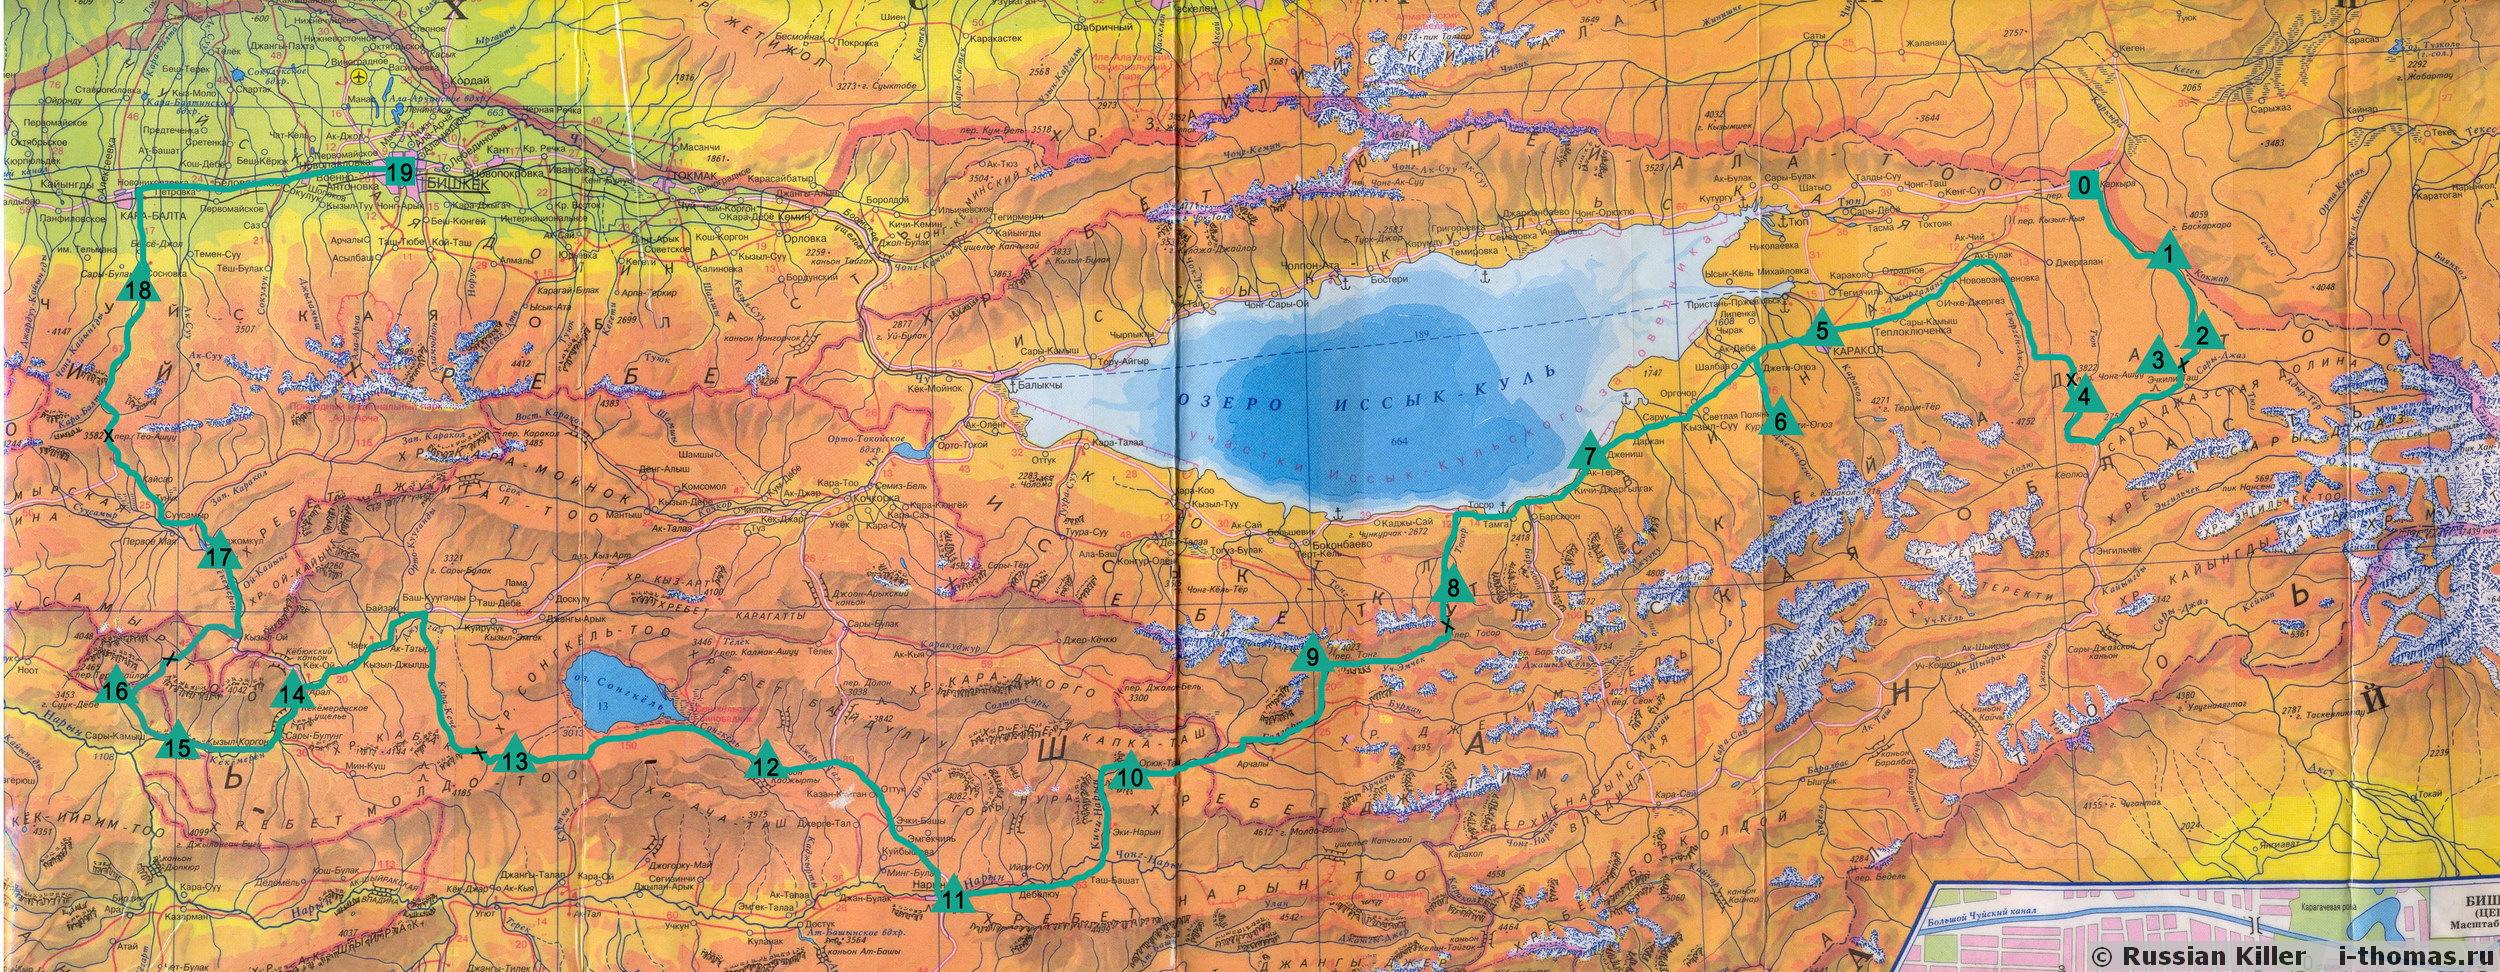 Tian Shan Mountains Map - #GolfClub